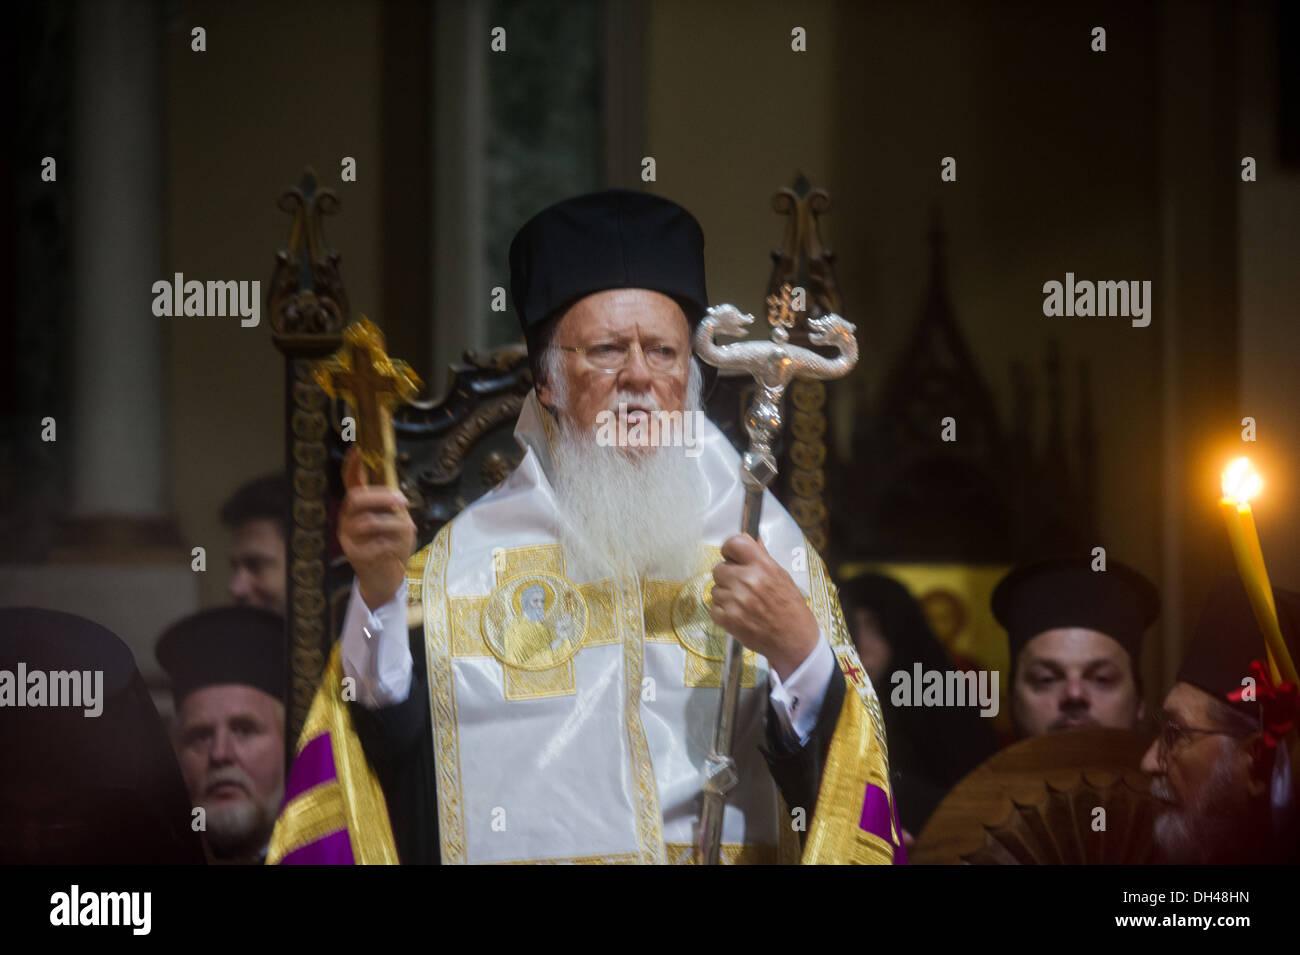 Copte orthodoxe site de rencontres